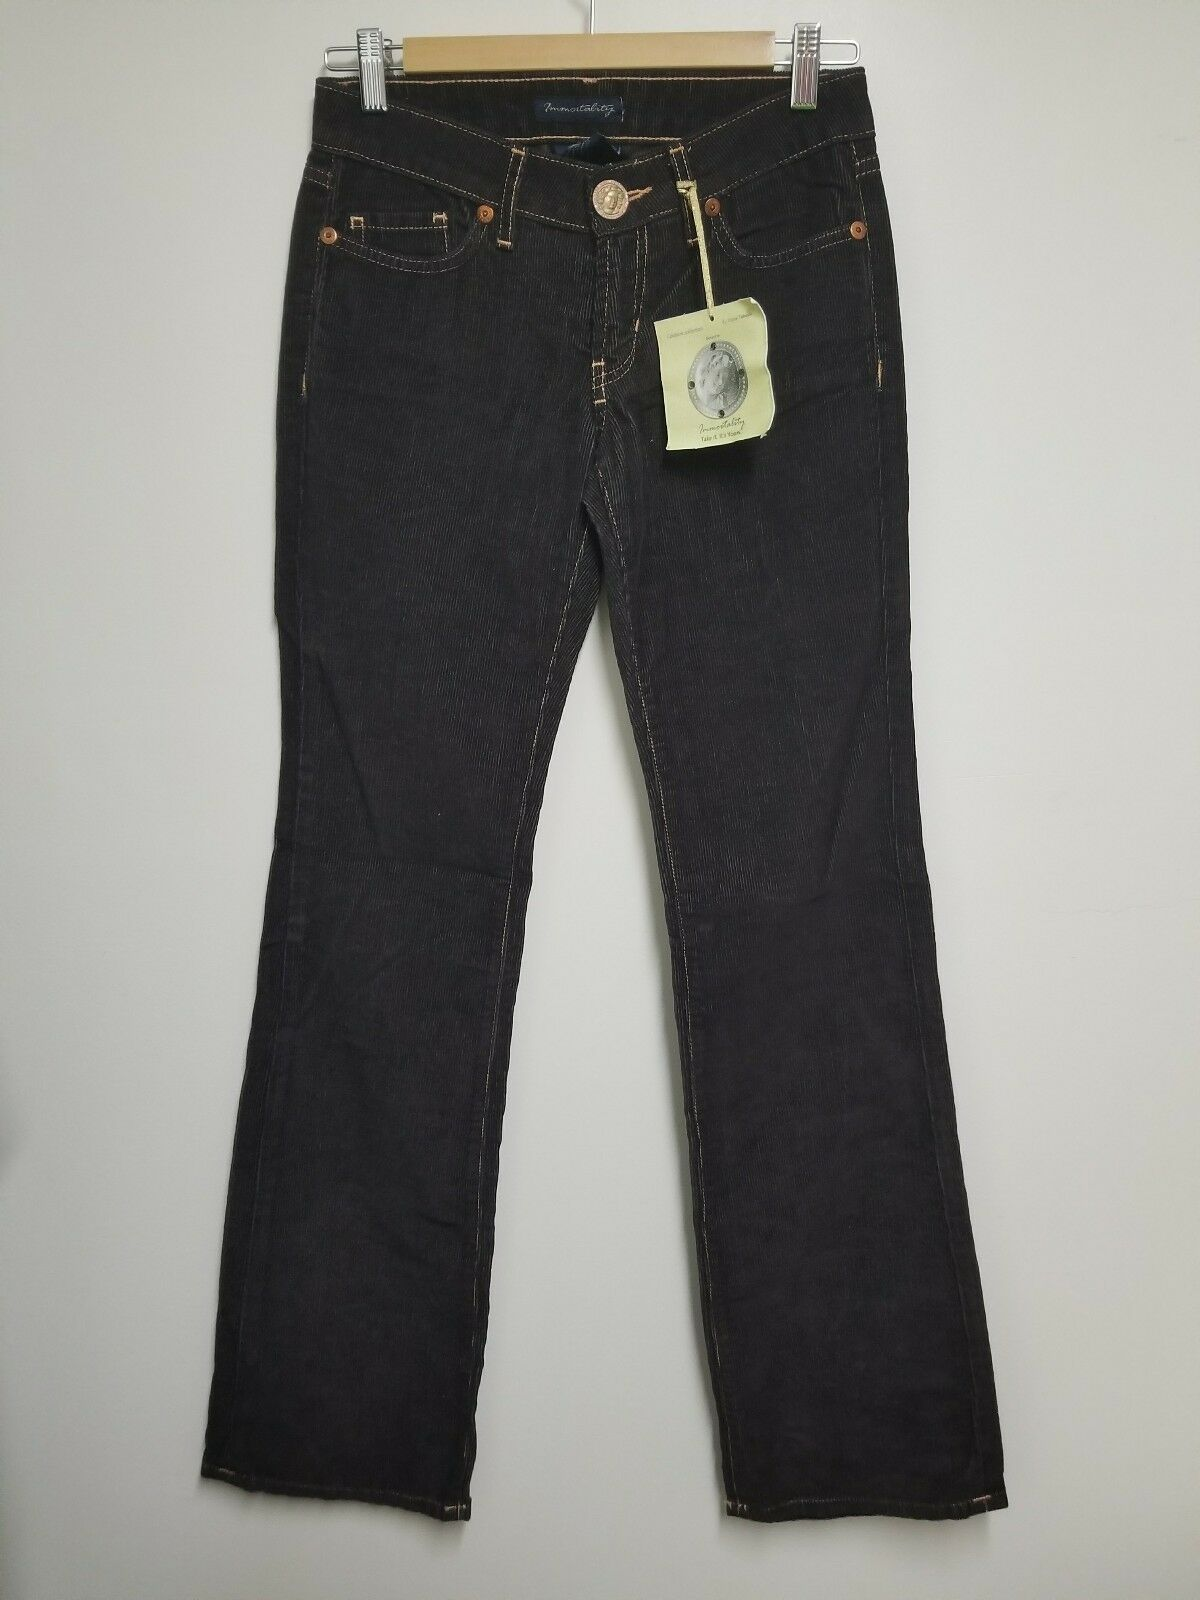 Immortality Diana Tabeshi Women's Brown Corduroy Jeans Jewel Button USA - Sz 26